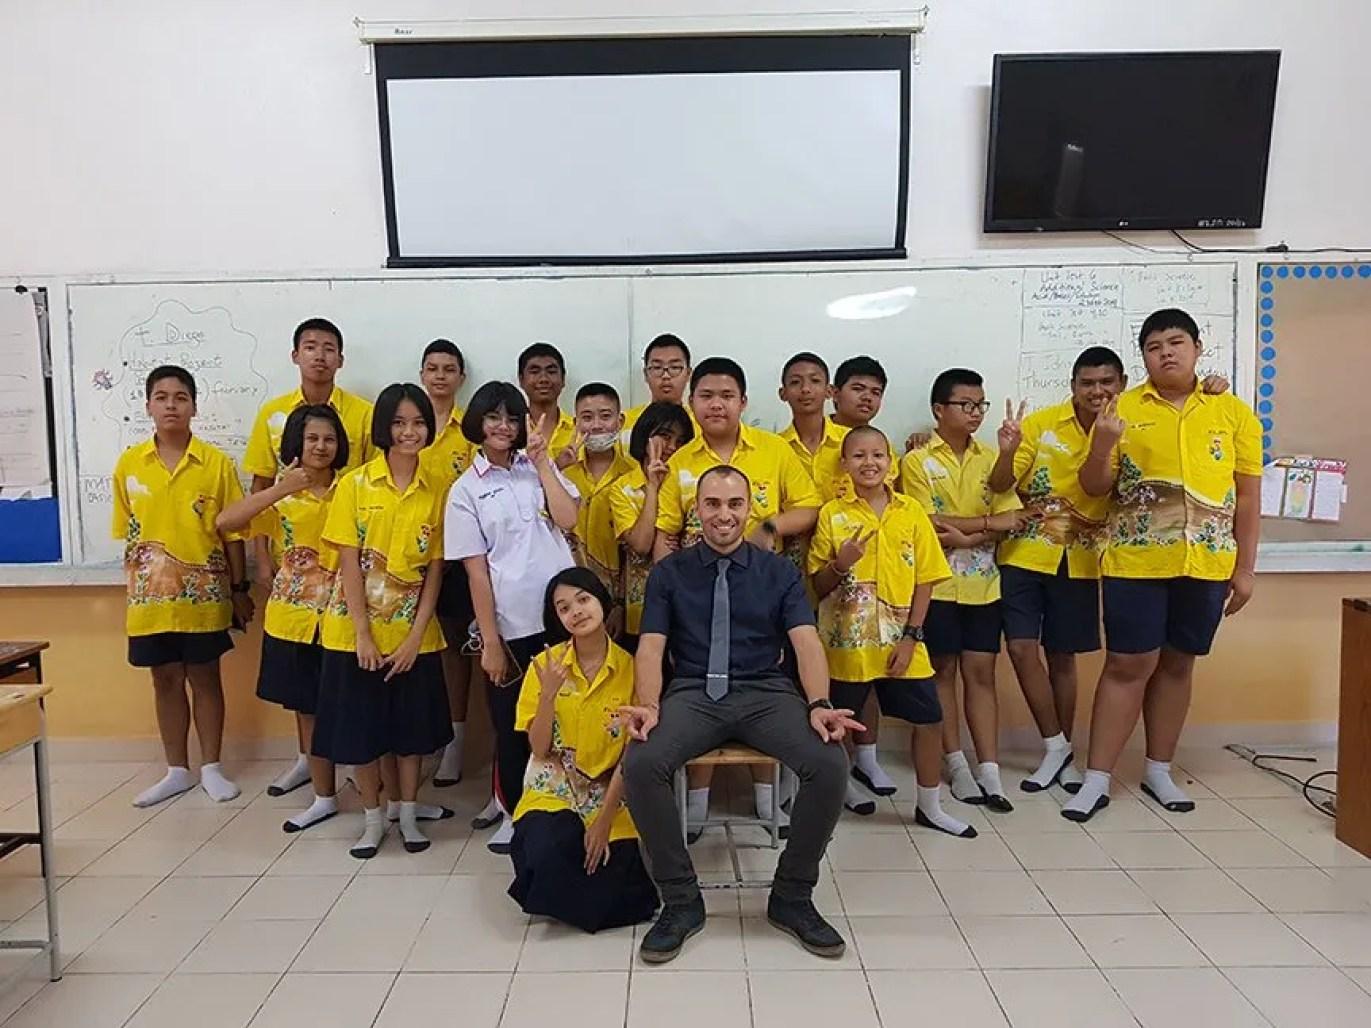 M3 students